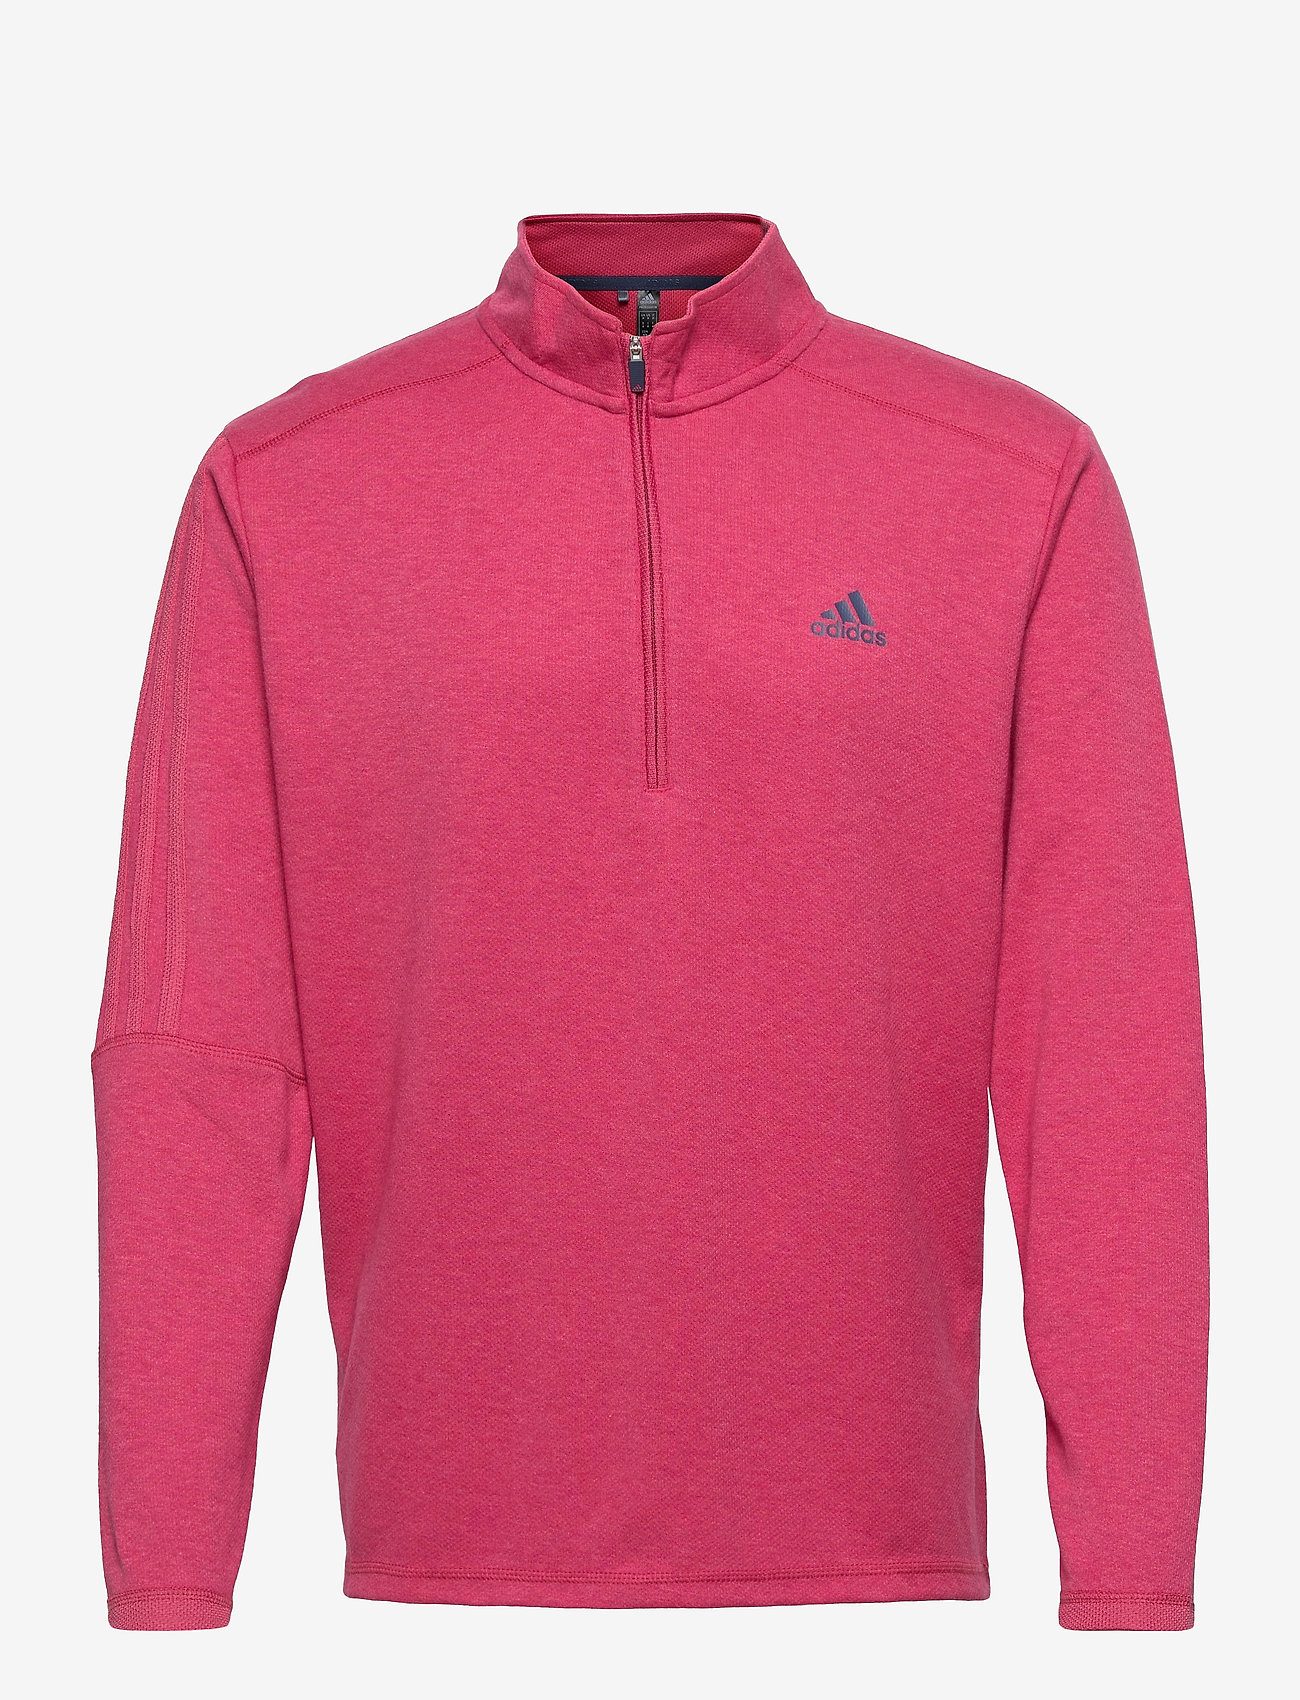 adidas Golf - 3 STP 1/4 Z LC - golf jackets - wlpnpn - 1